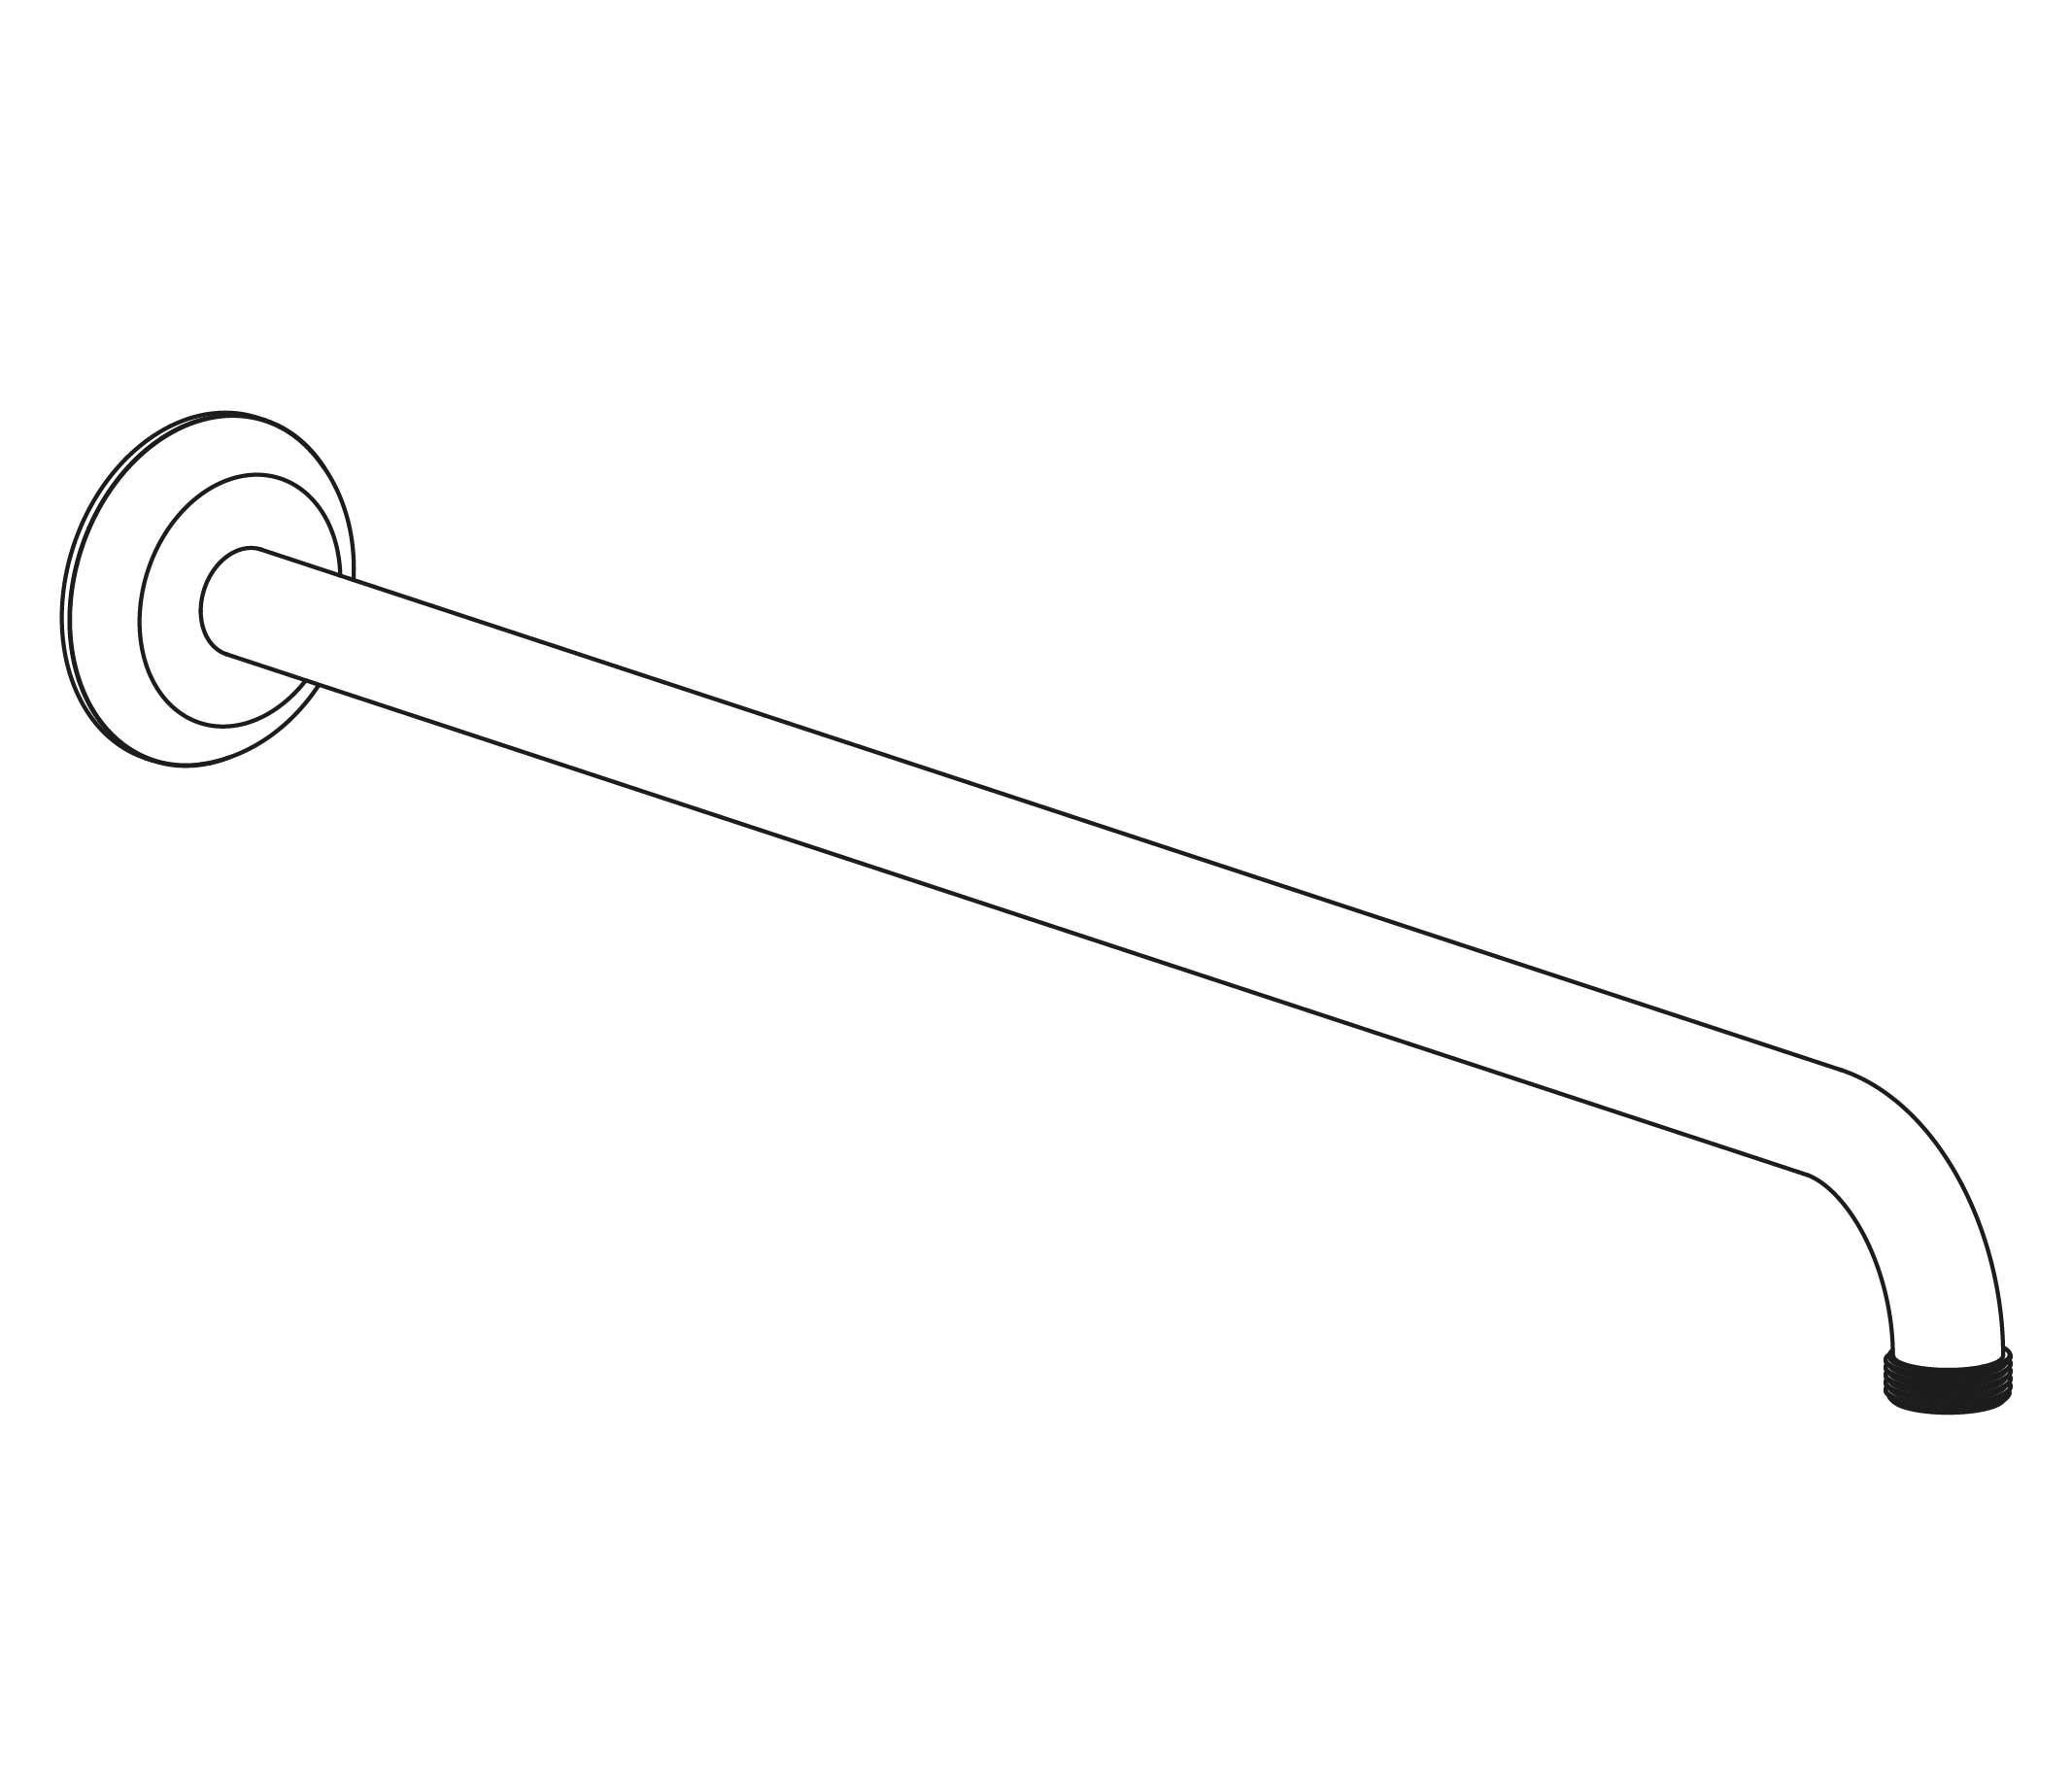 C45-2W450 Bras de douche mural 450mm